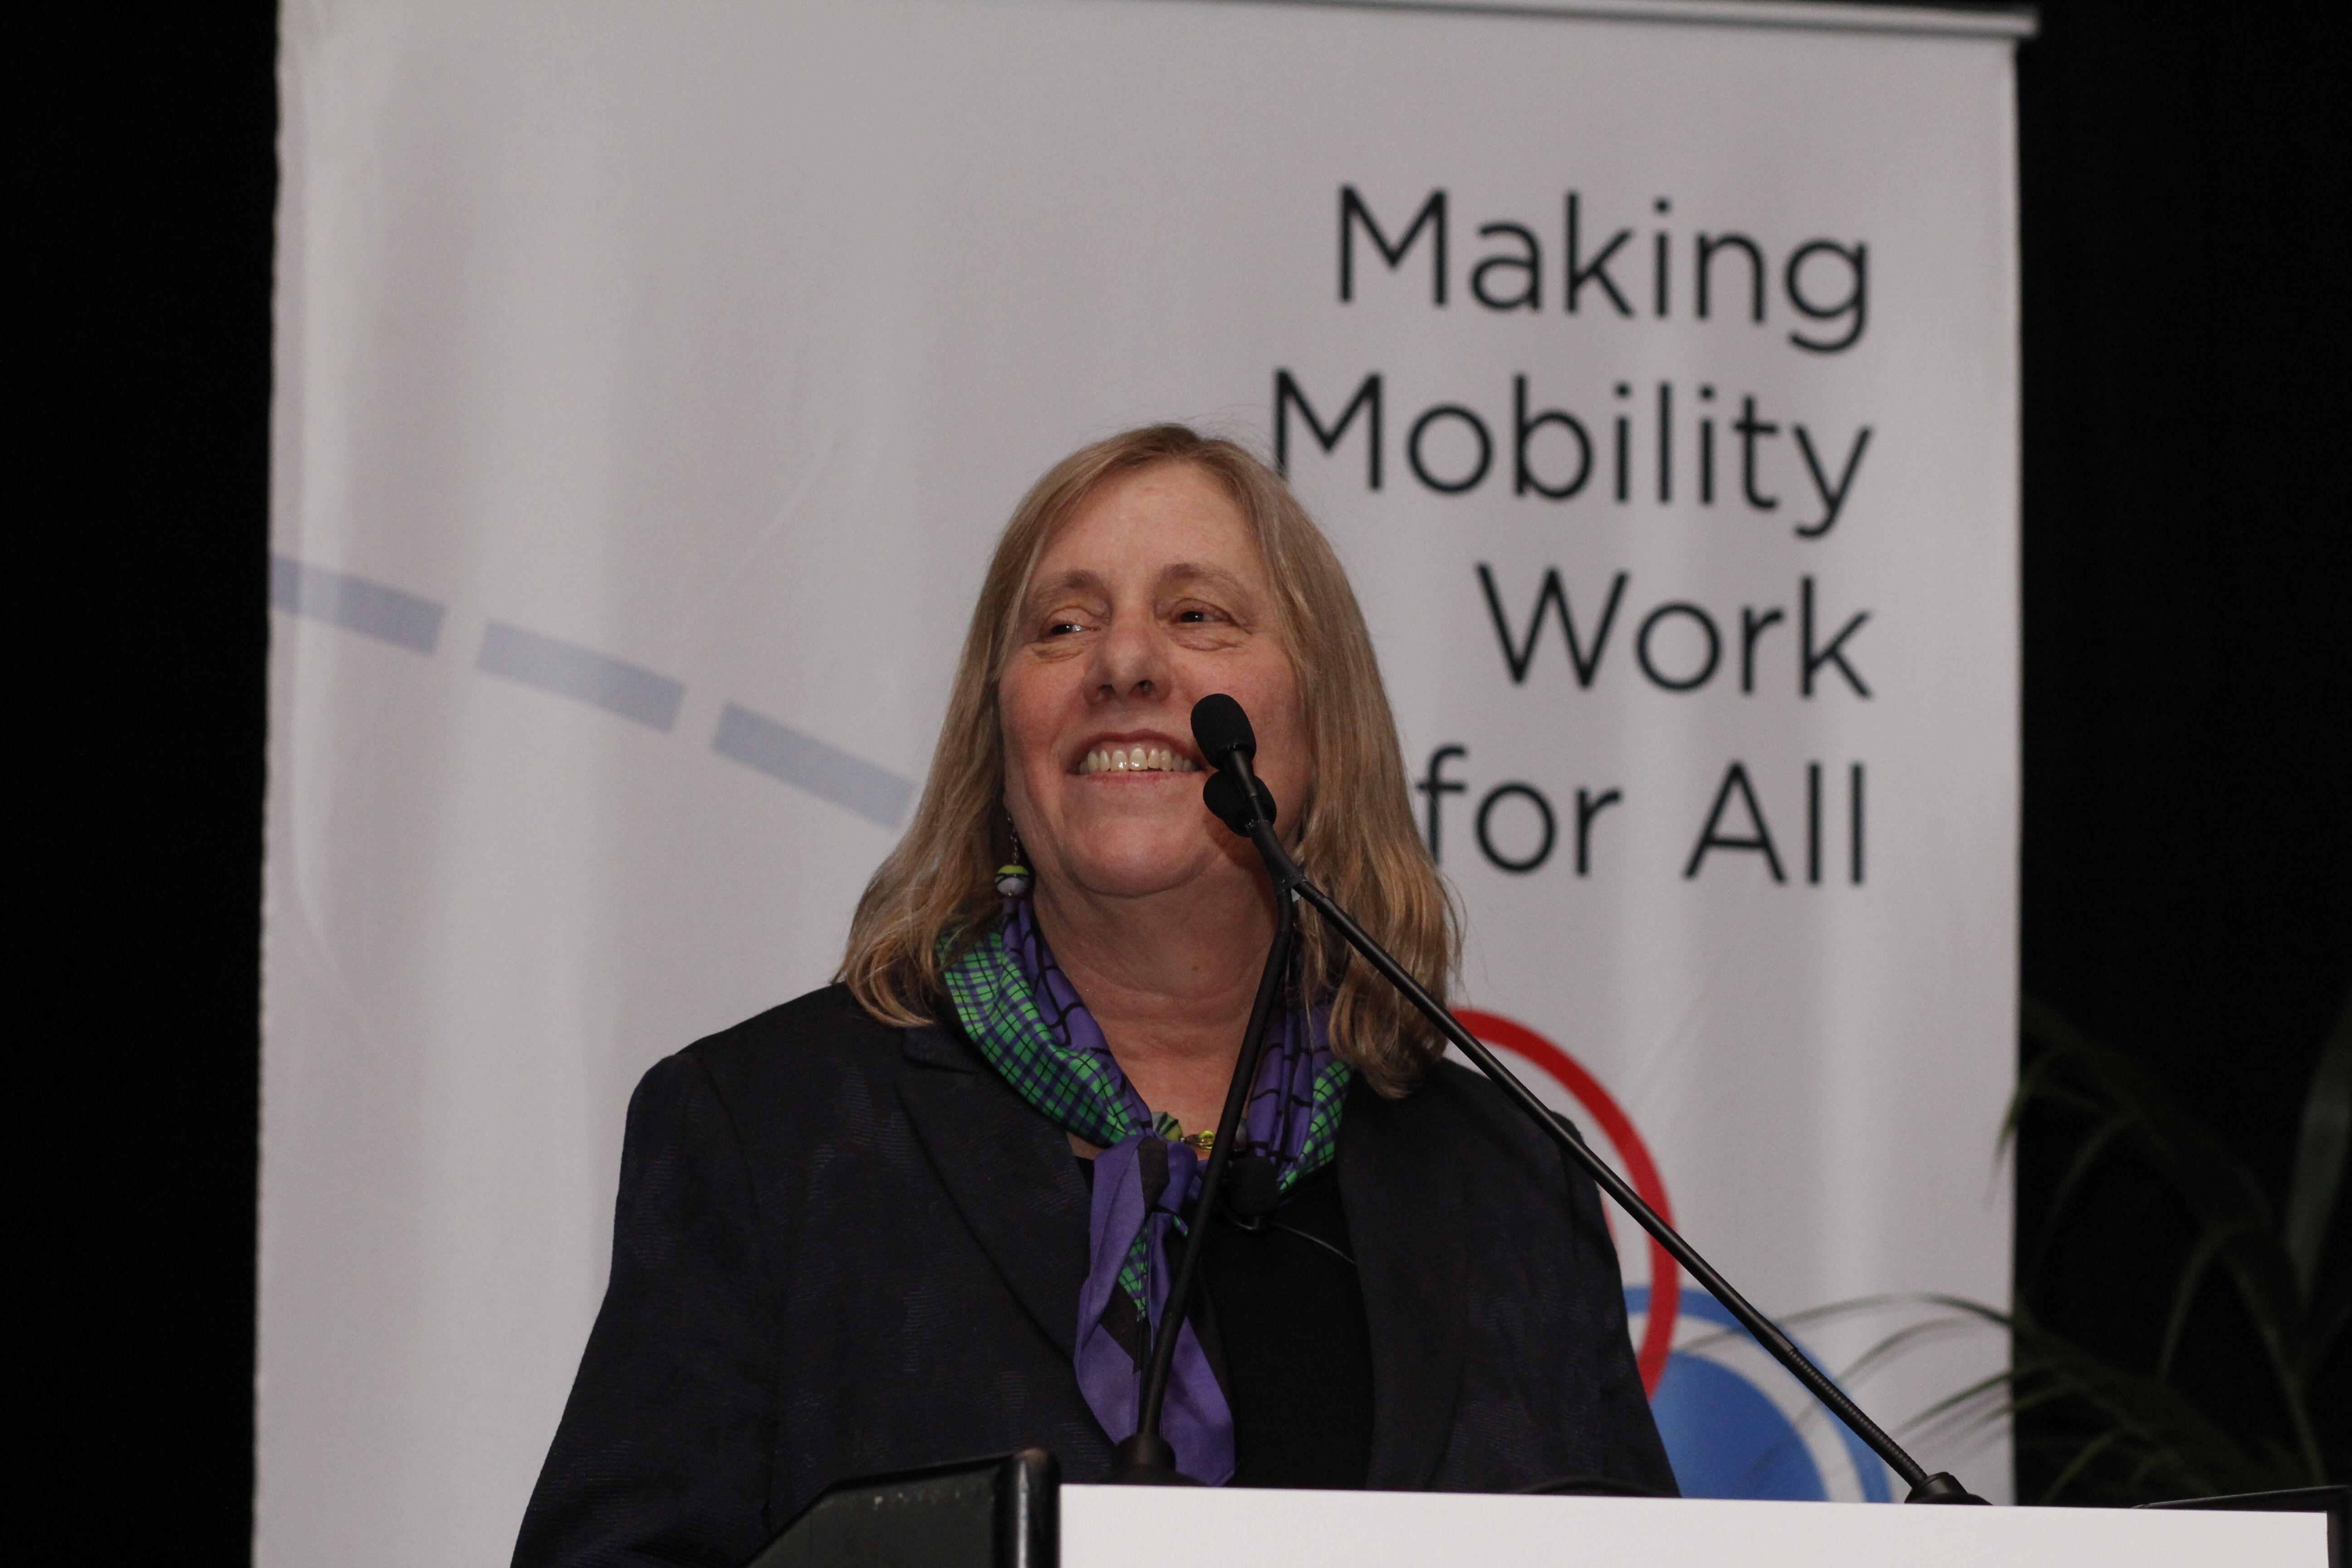 SUMC Executive Director Sharon Feigon's Top Ten Summit Takeaways